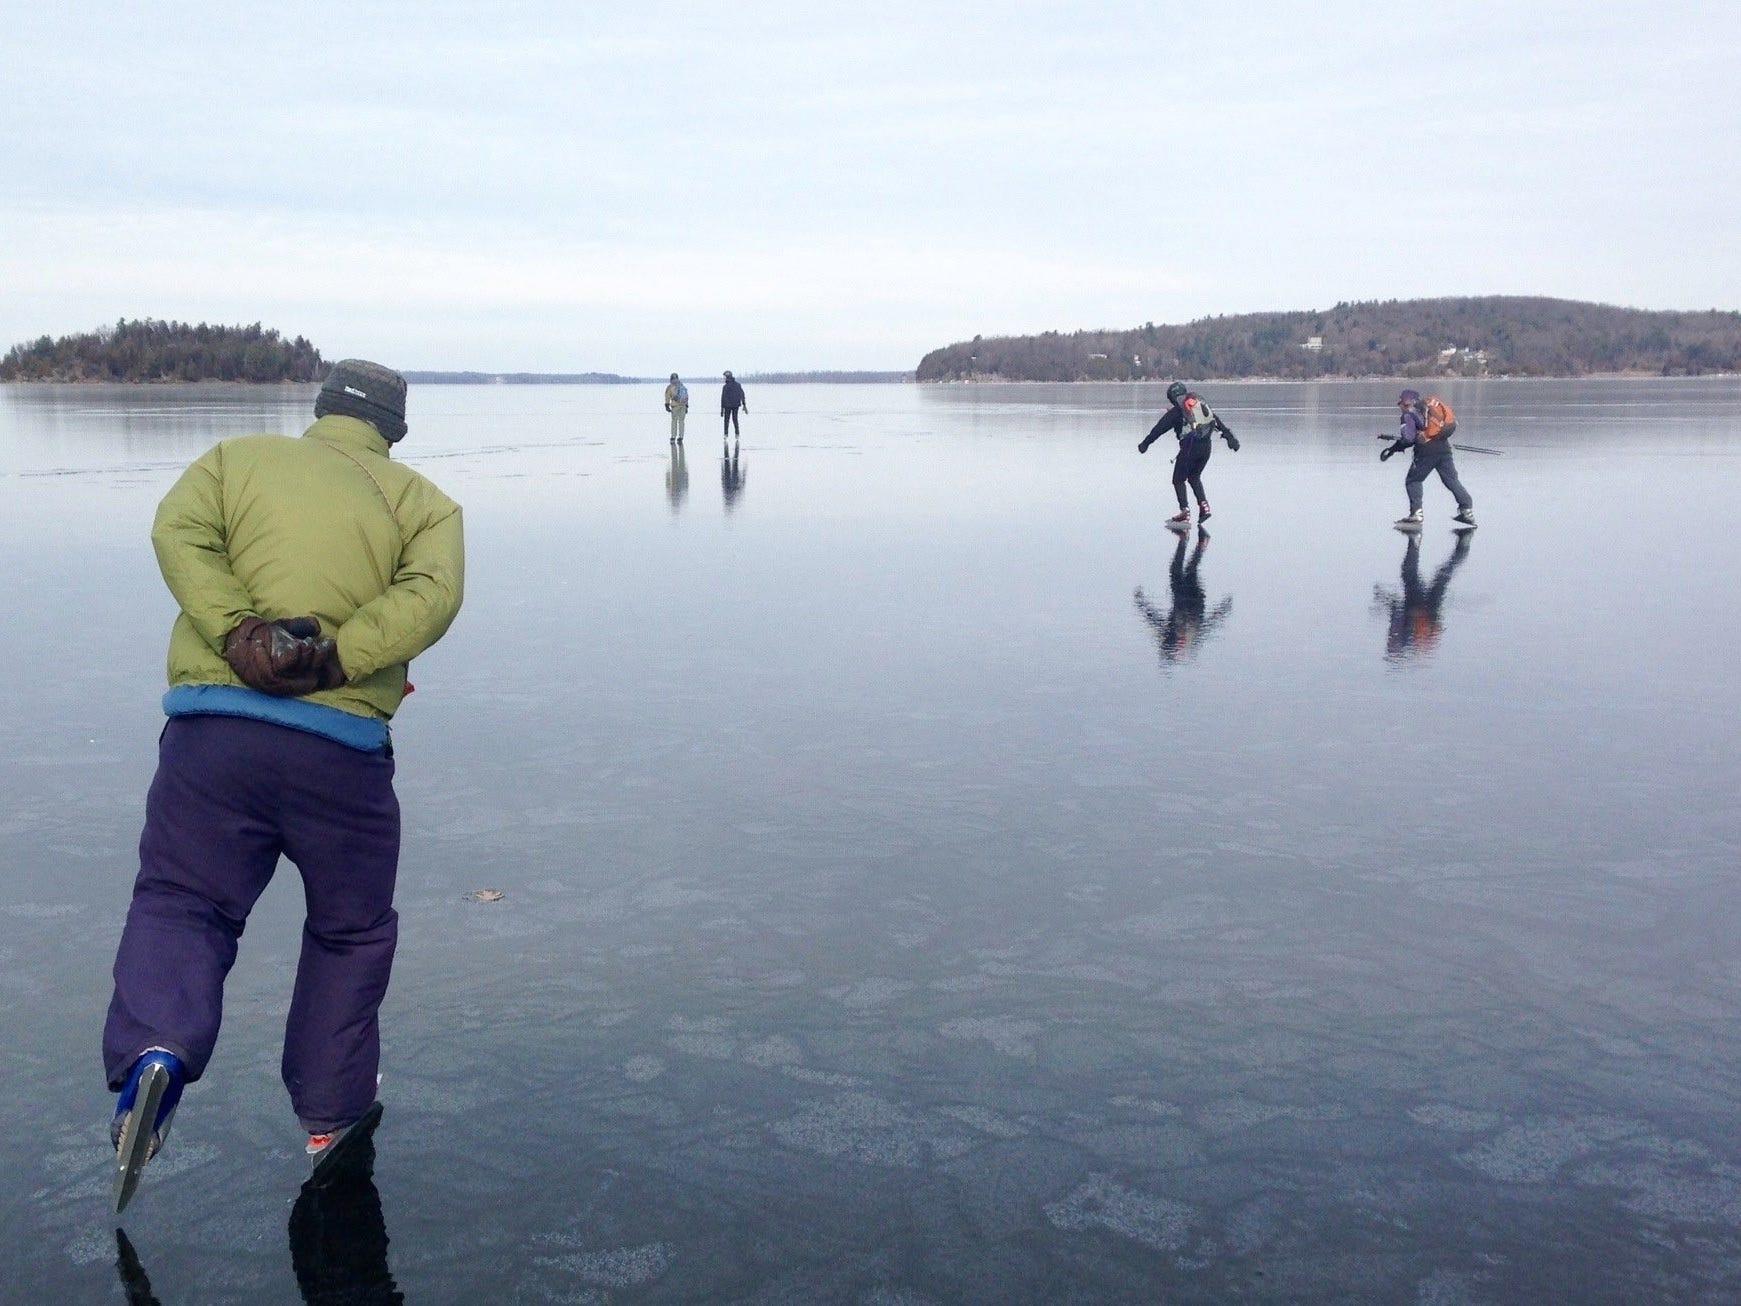 Nordic skaters glide across Malletts Bay in Lake Champlain in February 2016.